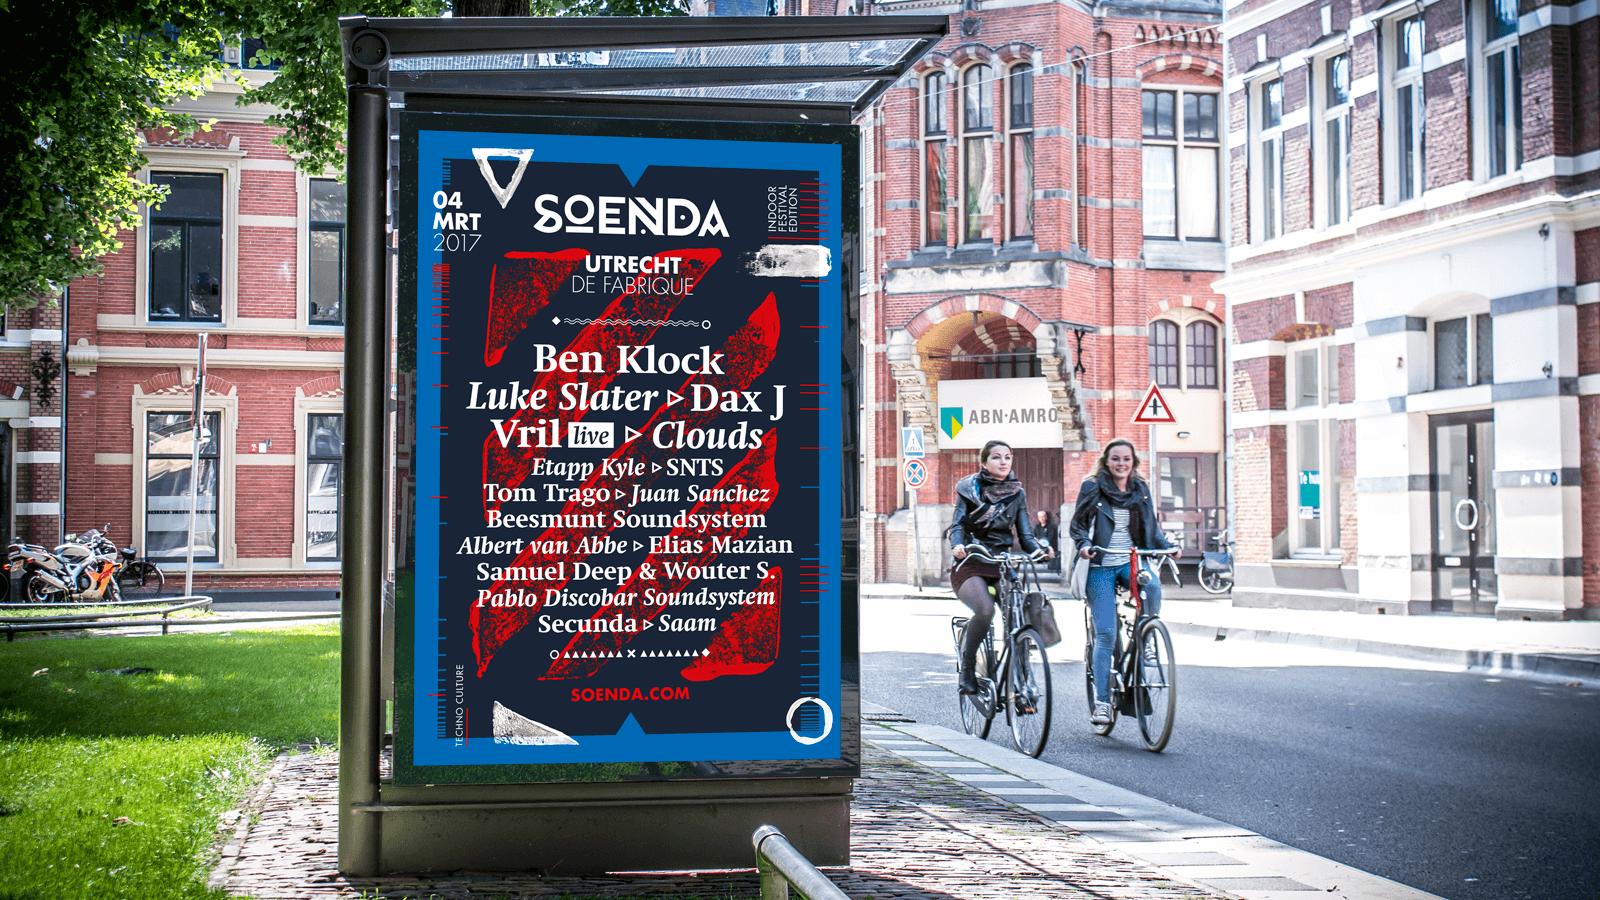 Soenda-Posters-4mrt-2017